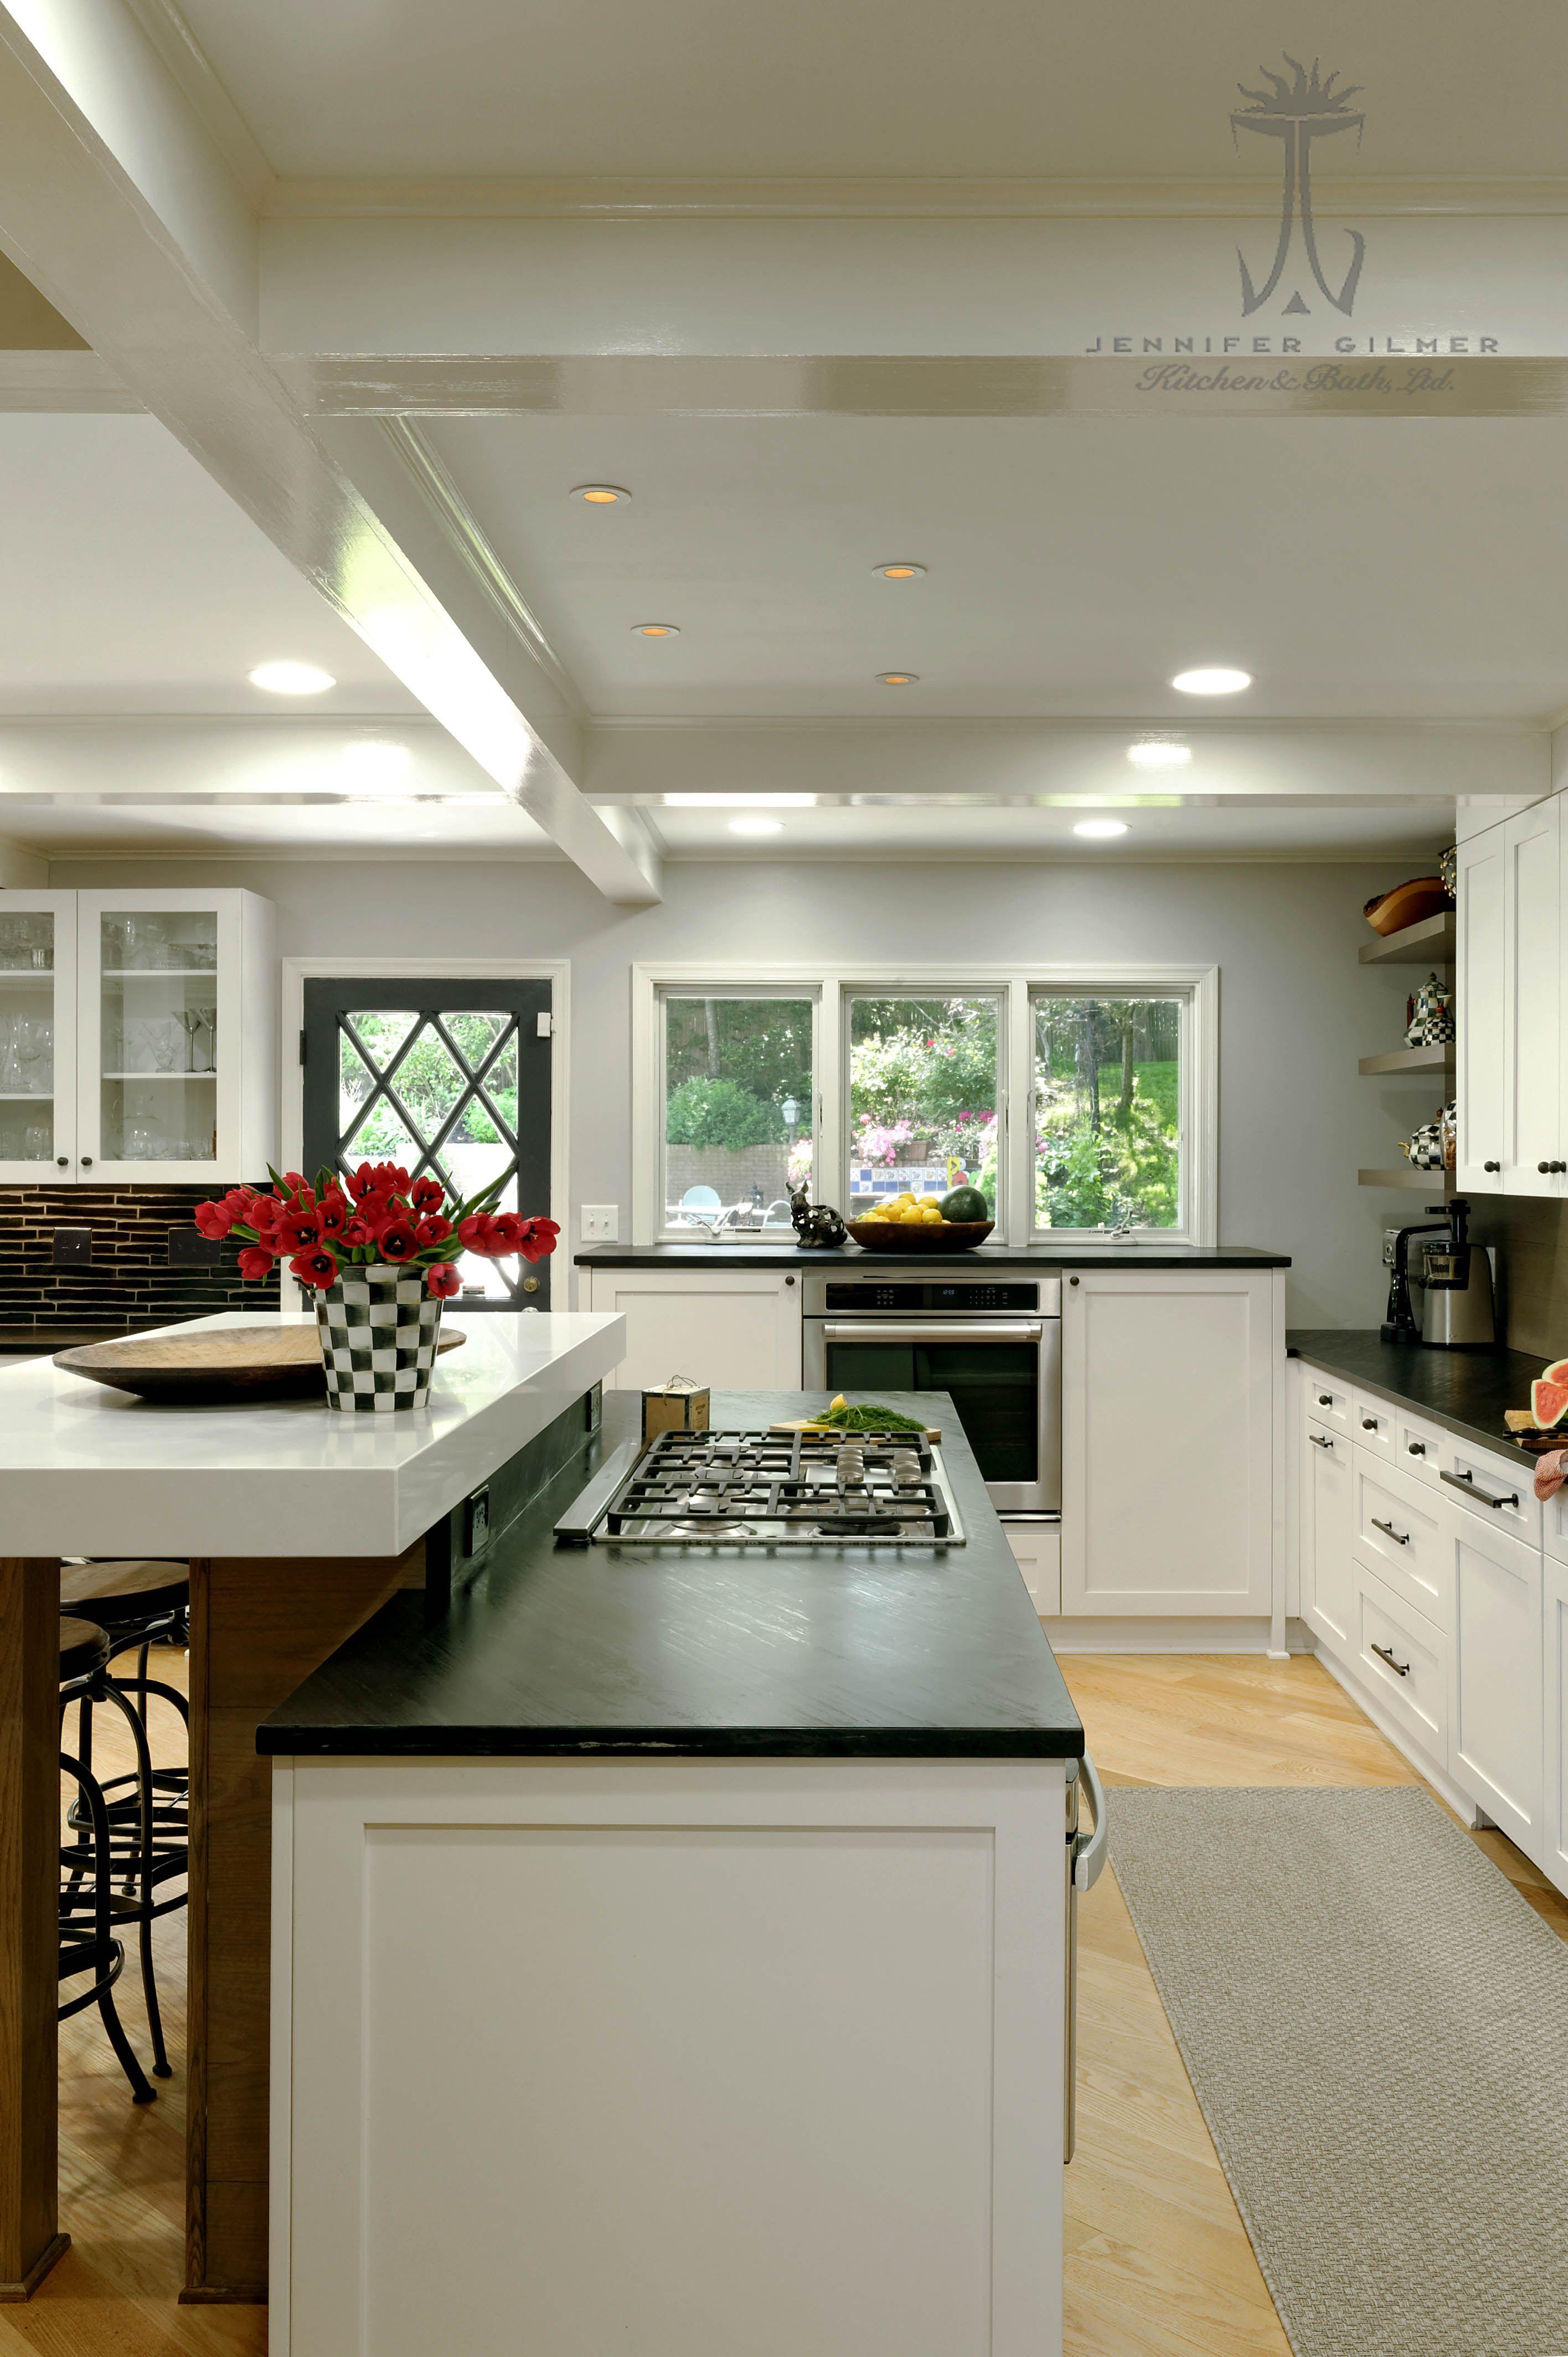 Design By #JenniferGilmer Of Jennifer Gilmer Kitchen U0026 Bath In Alexandria,  Virginia Includes Miele Part 72